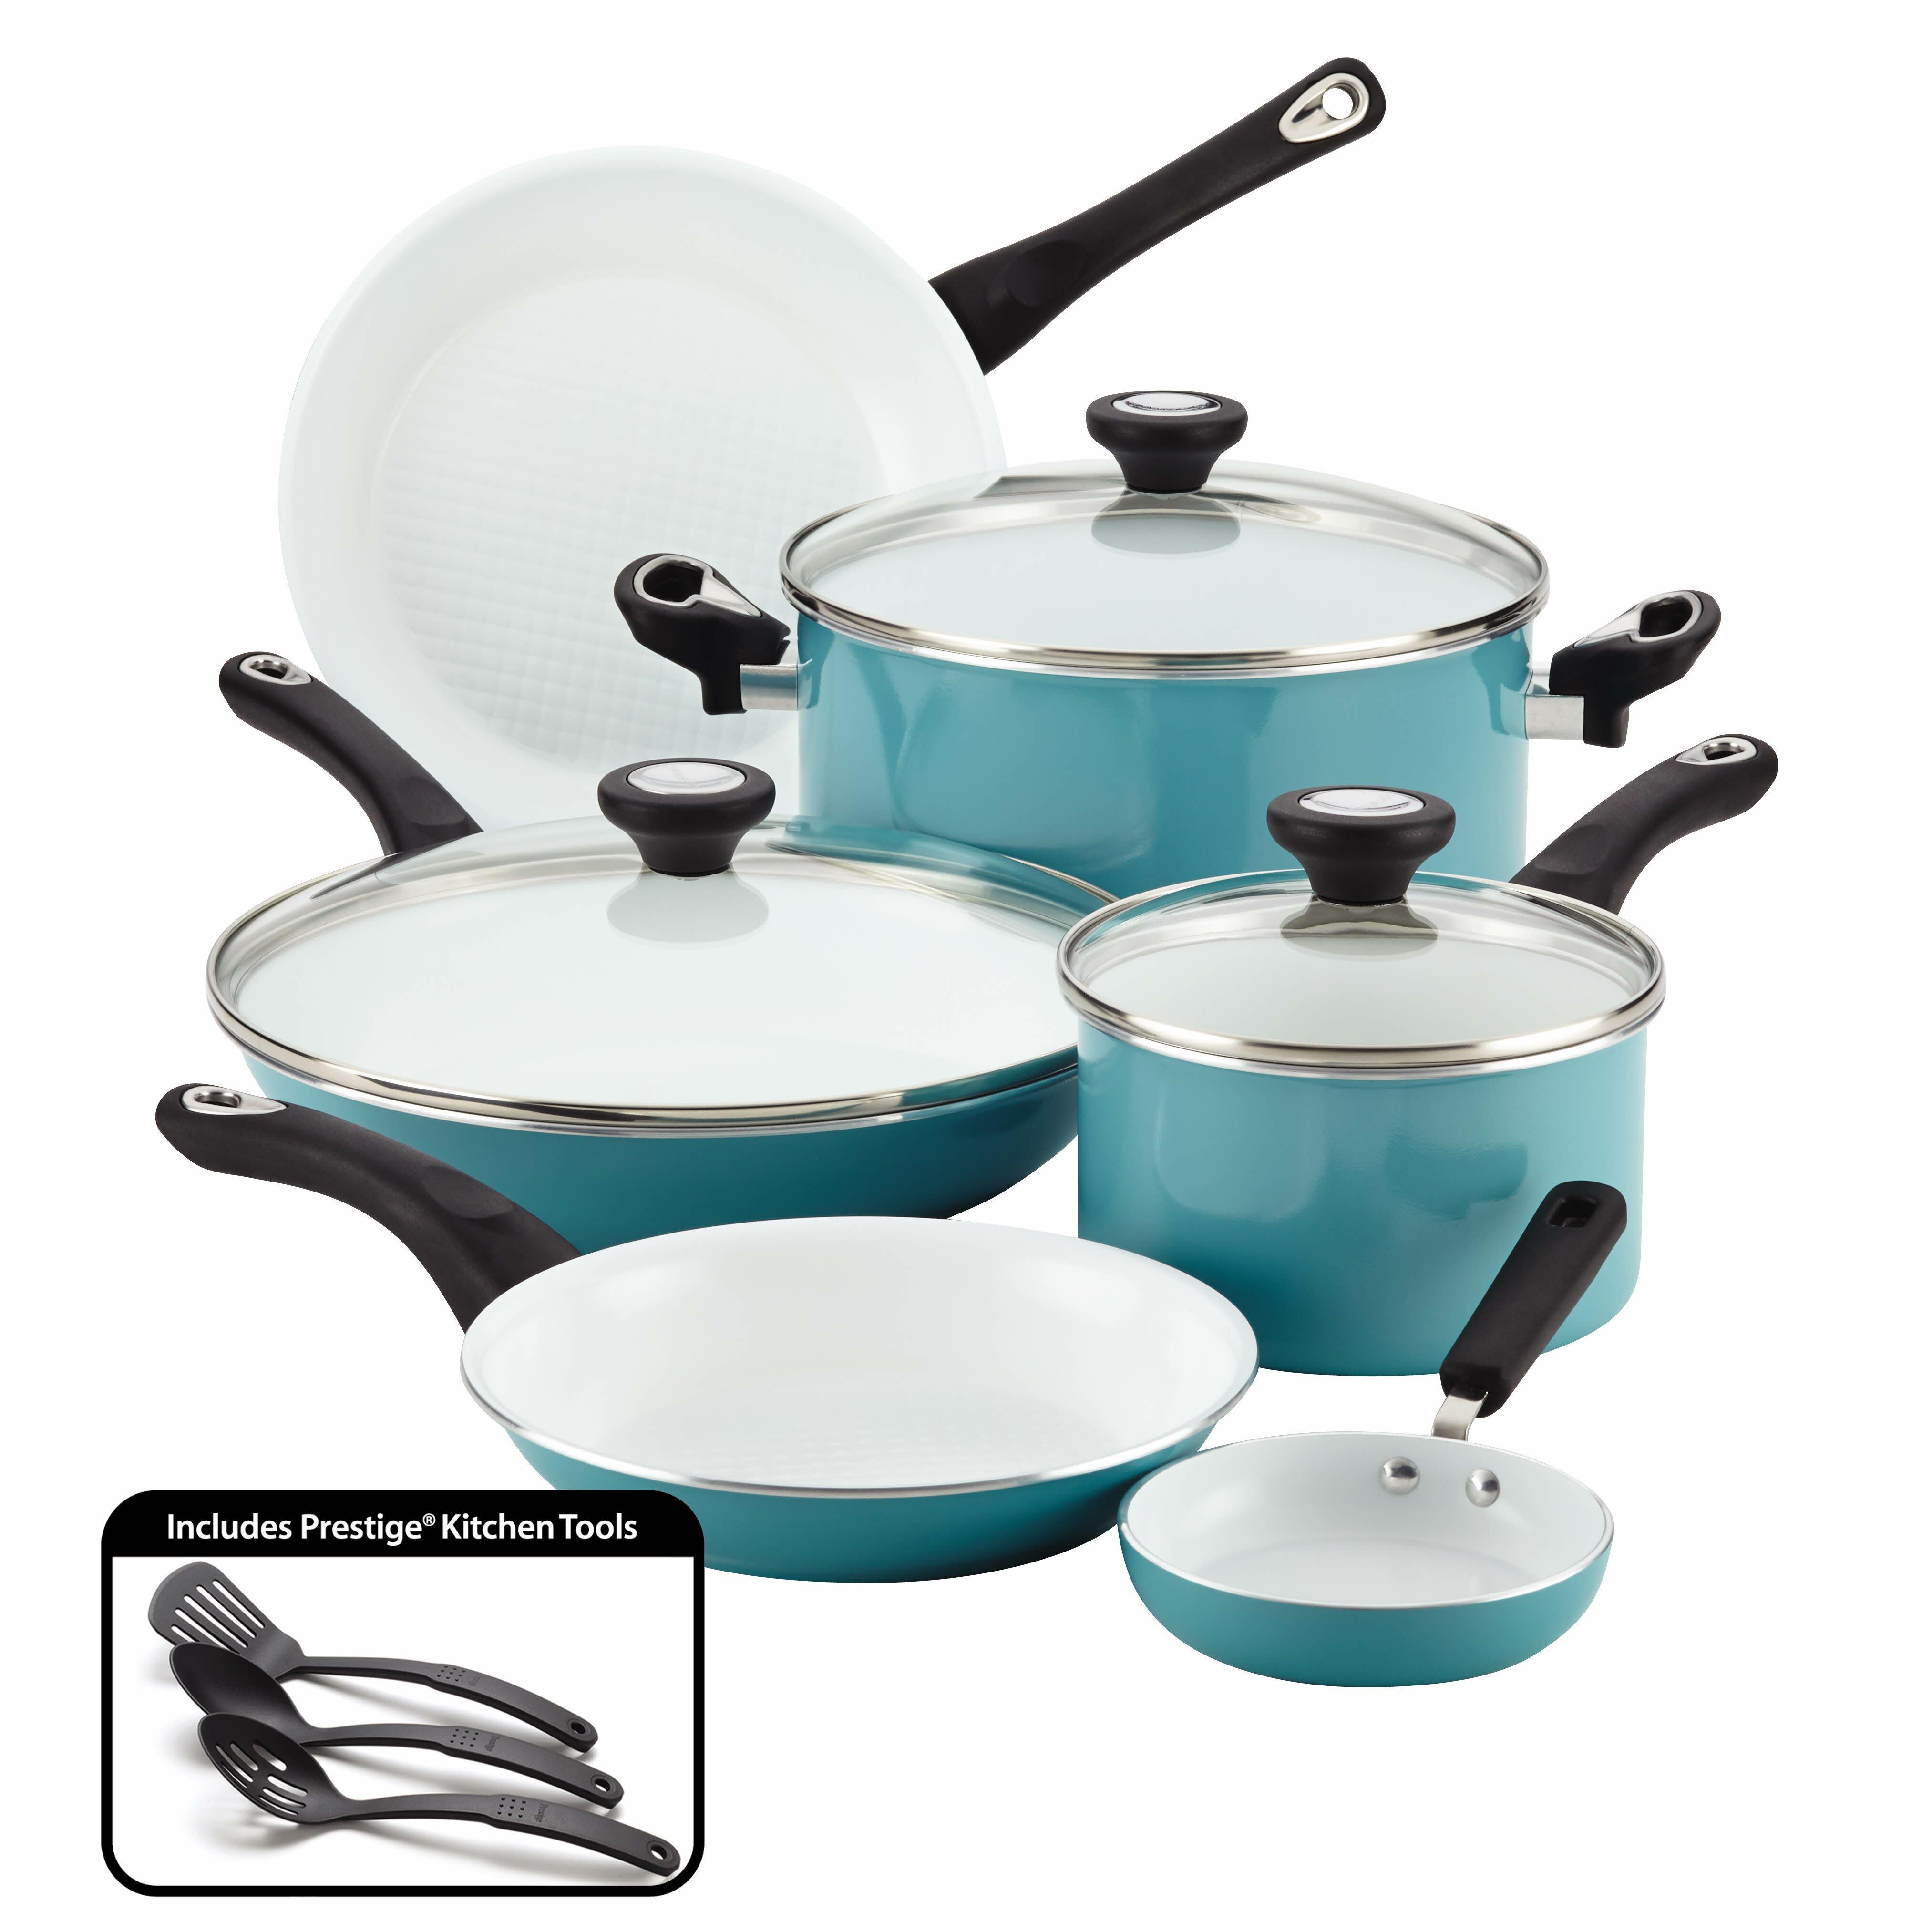 Green Color Aluminium 7pcs Ceramic Cookware Sets In Modern ... |Colorful Ceramic Cookware